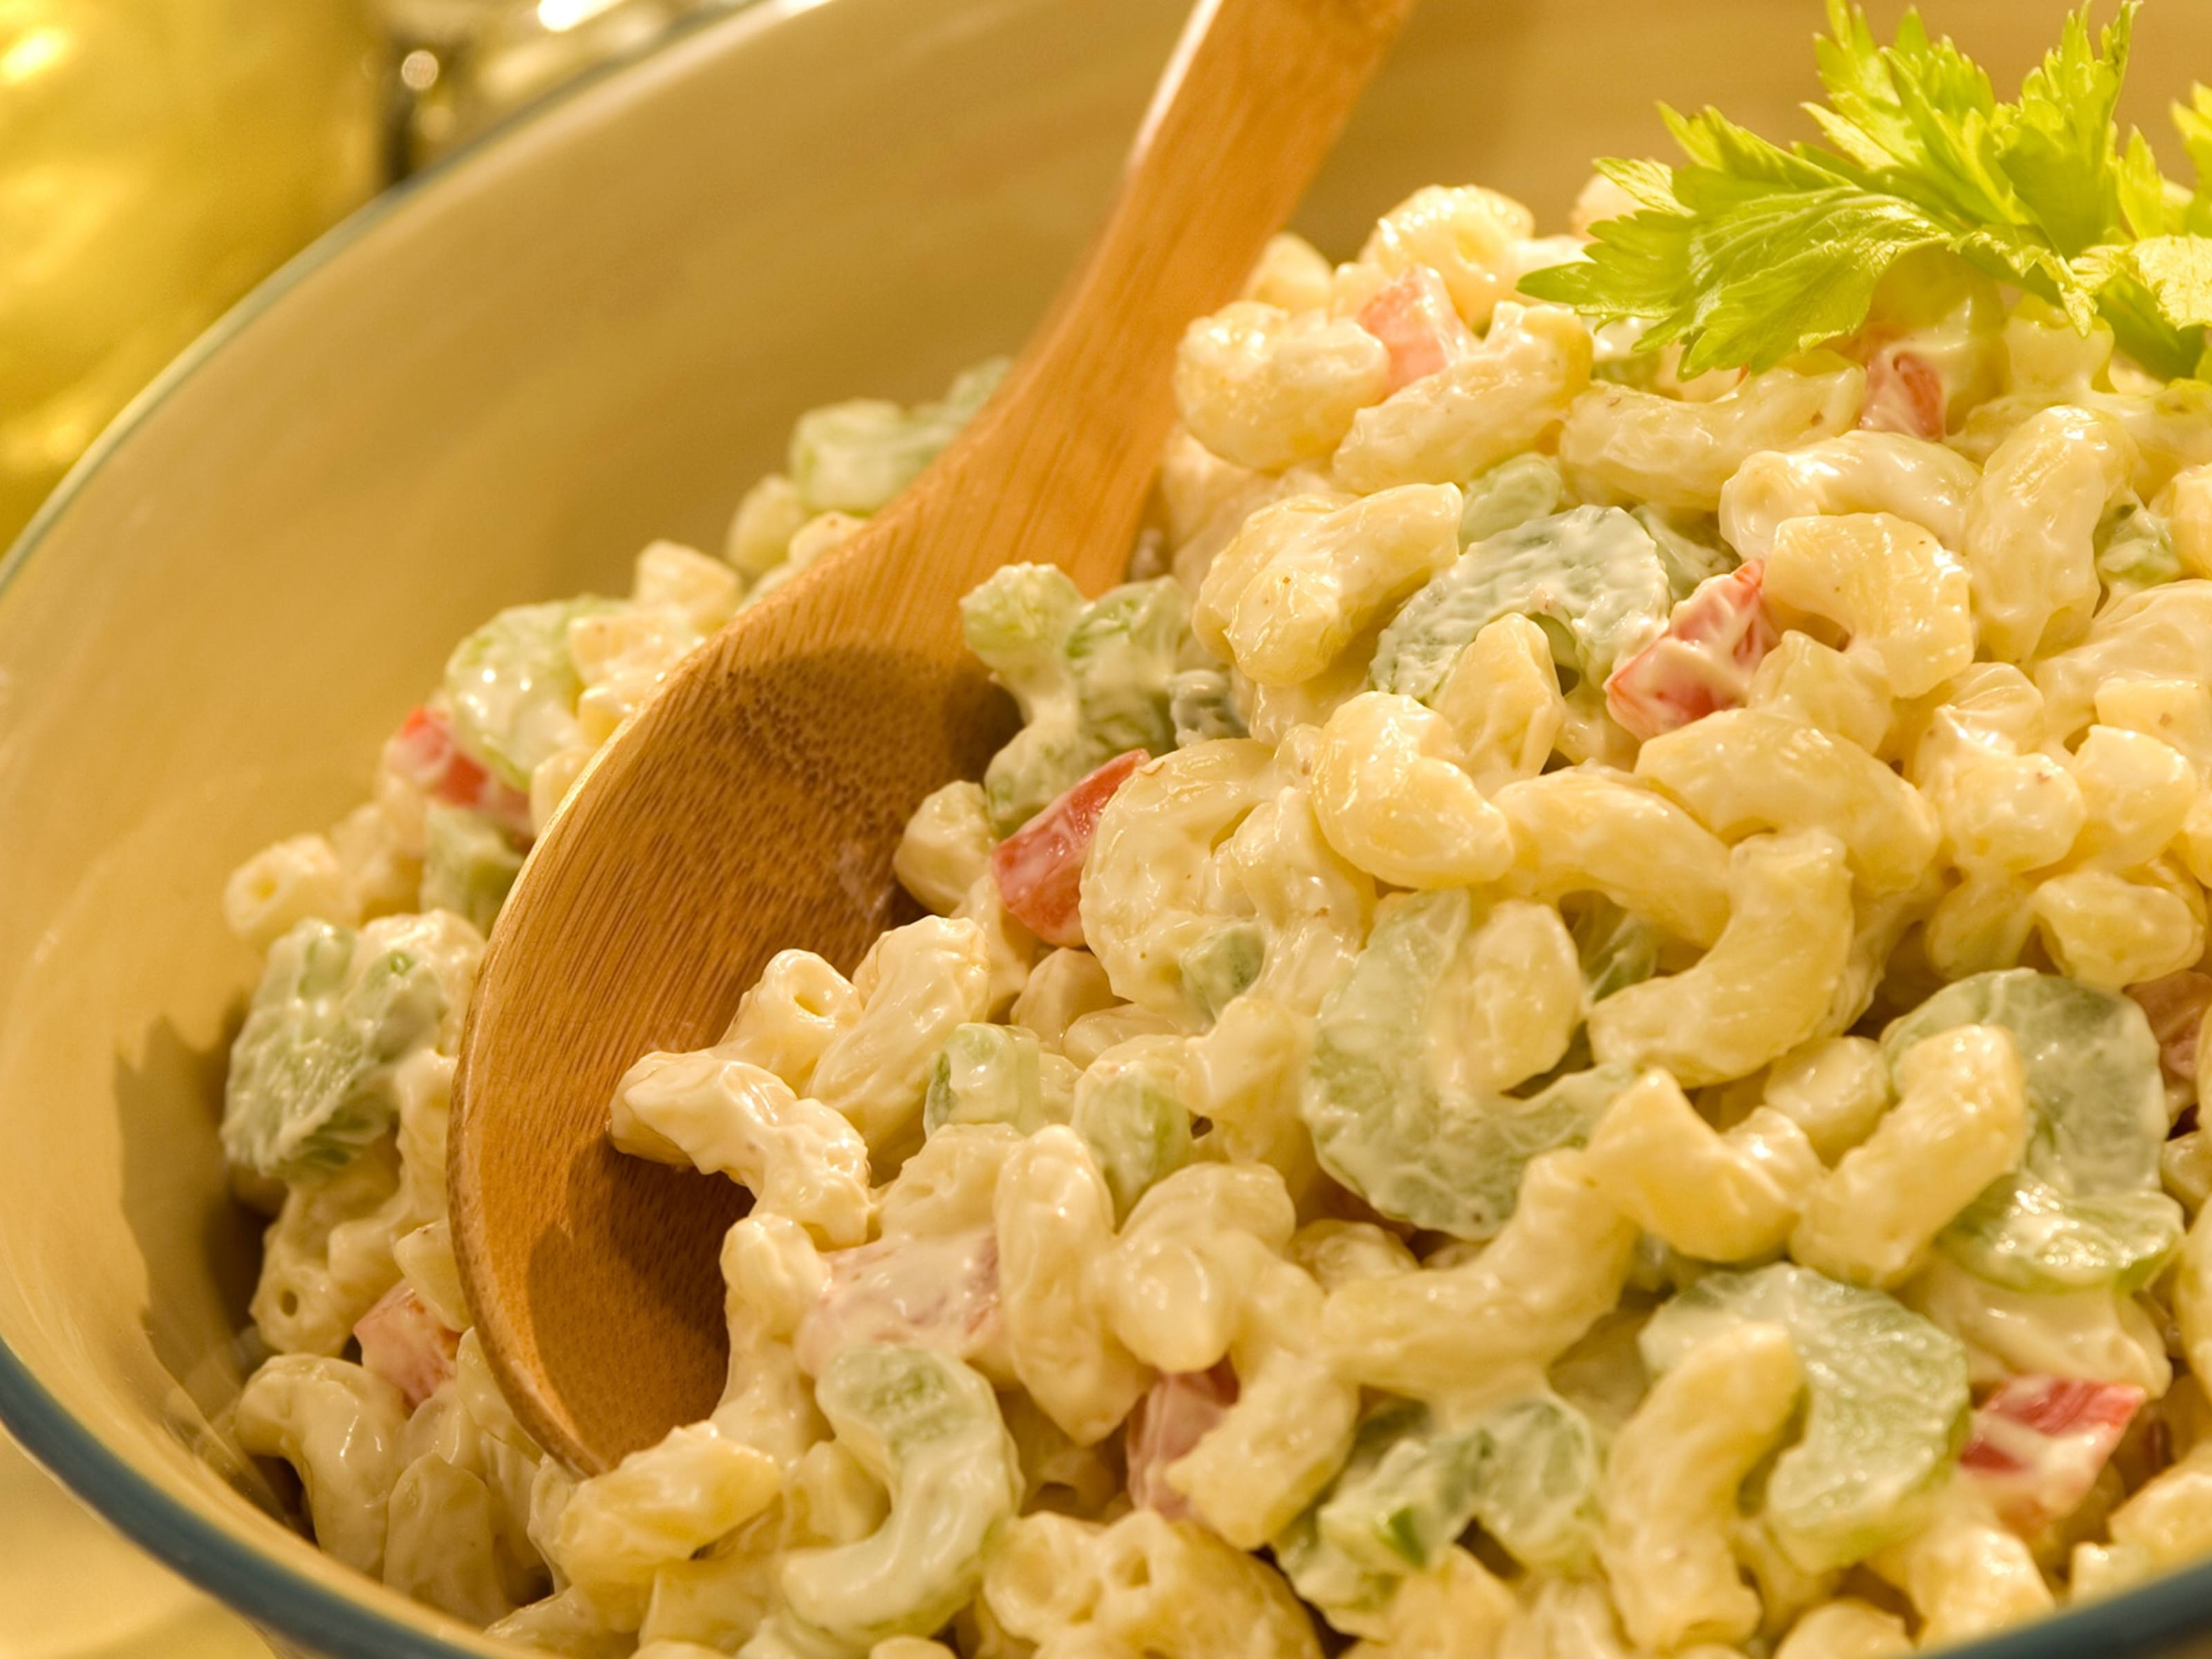 Classic macaroni salad hellmanns us forumfinder Gallery